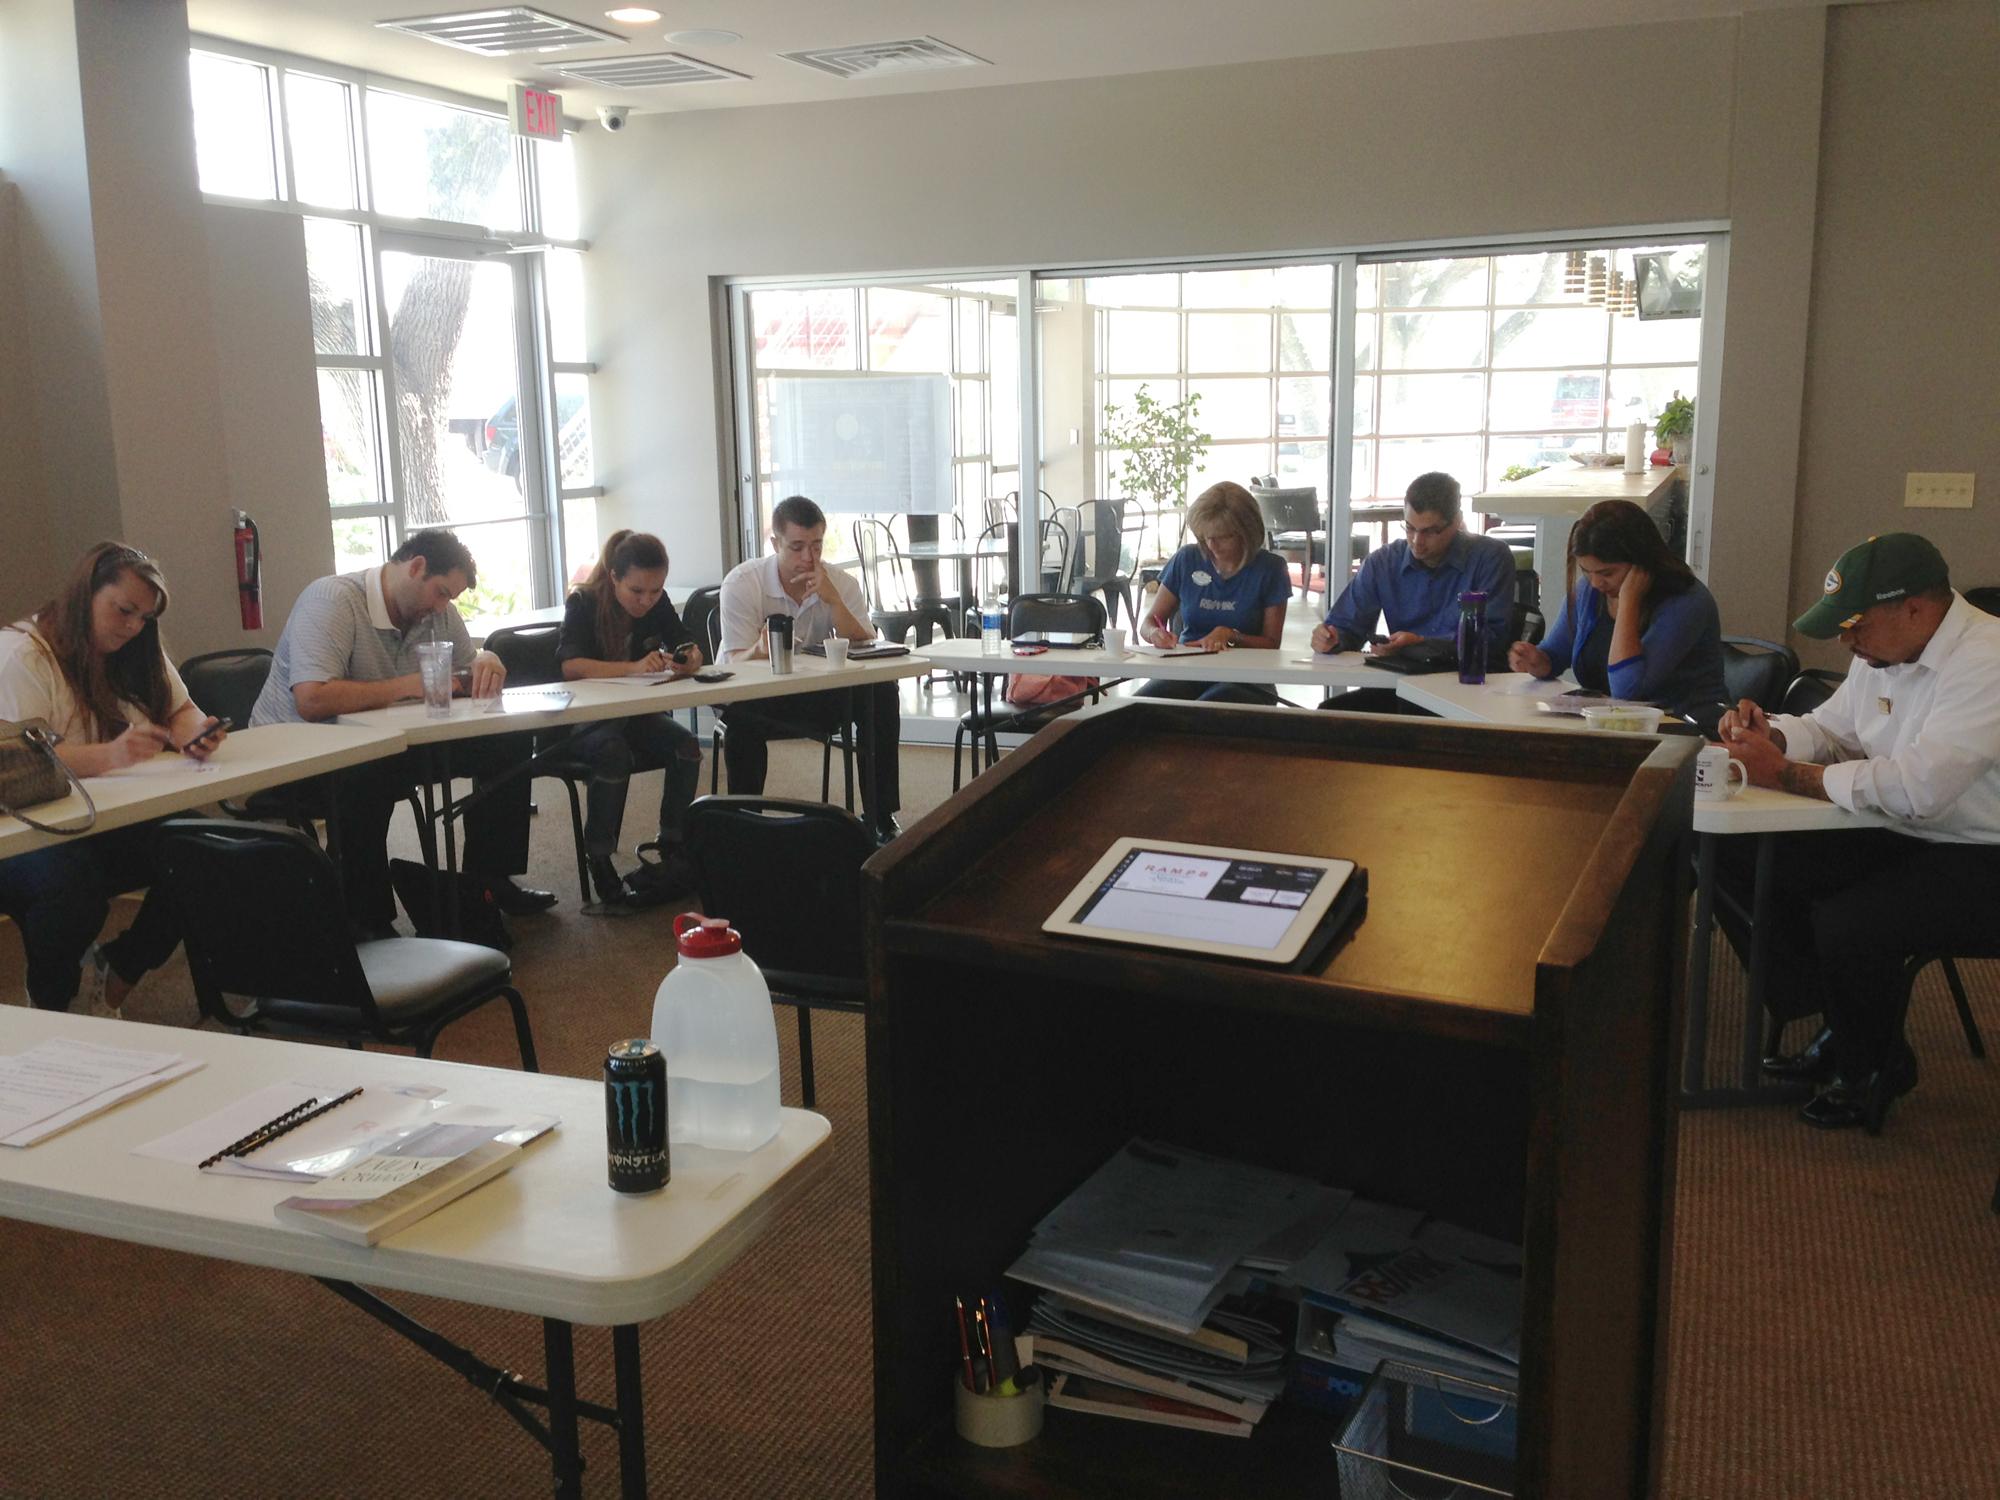 REMAX Class Participation Real Estate REALTOR